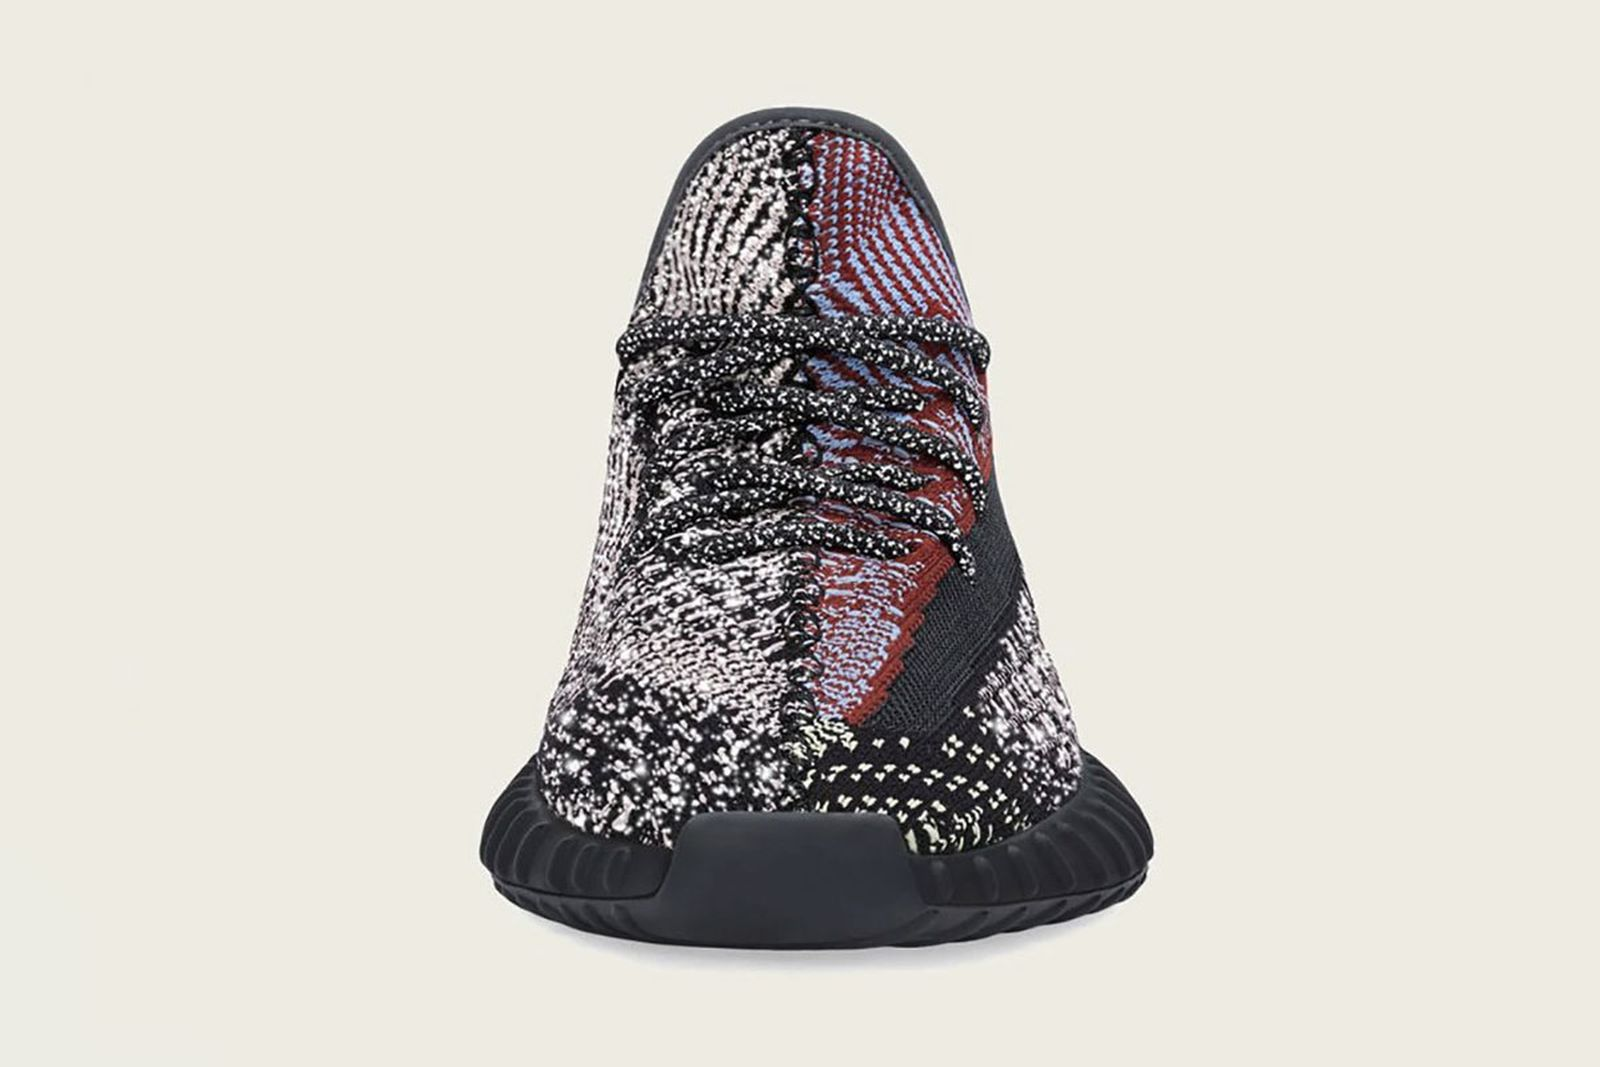 adidas-yeezy-boost-350-v2-yecheil-release-date-price-03